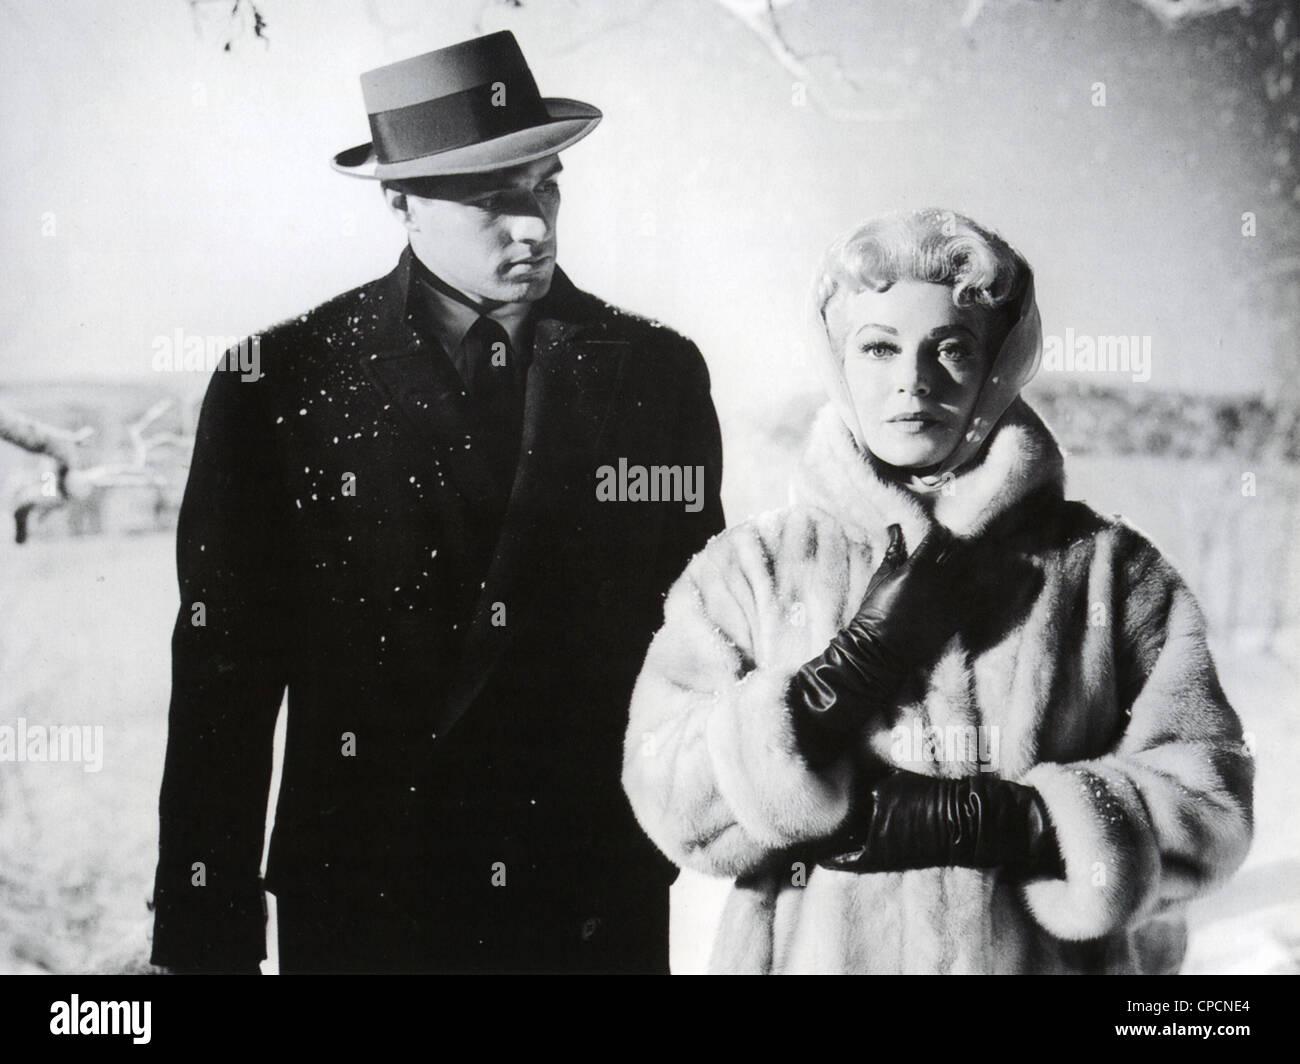 IMITATION OF LIFE 1959 Universal International film with Lana Turner as  Lora and John Gavin as